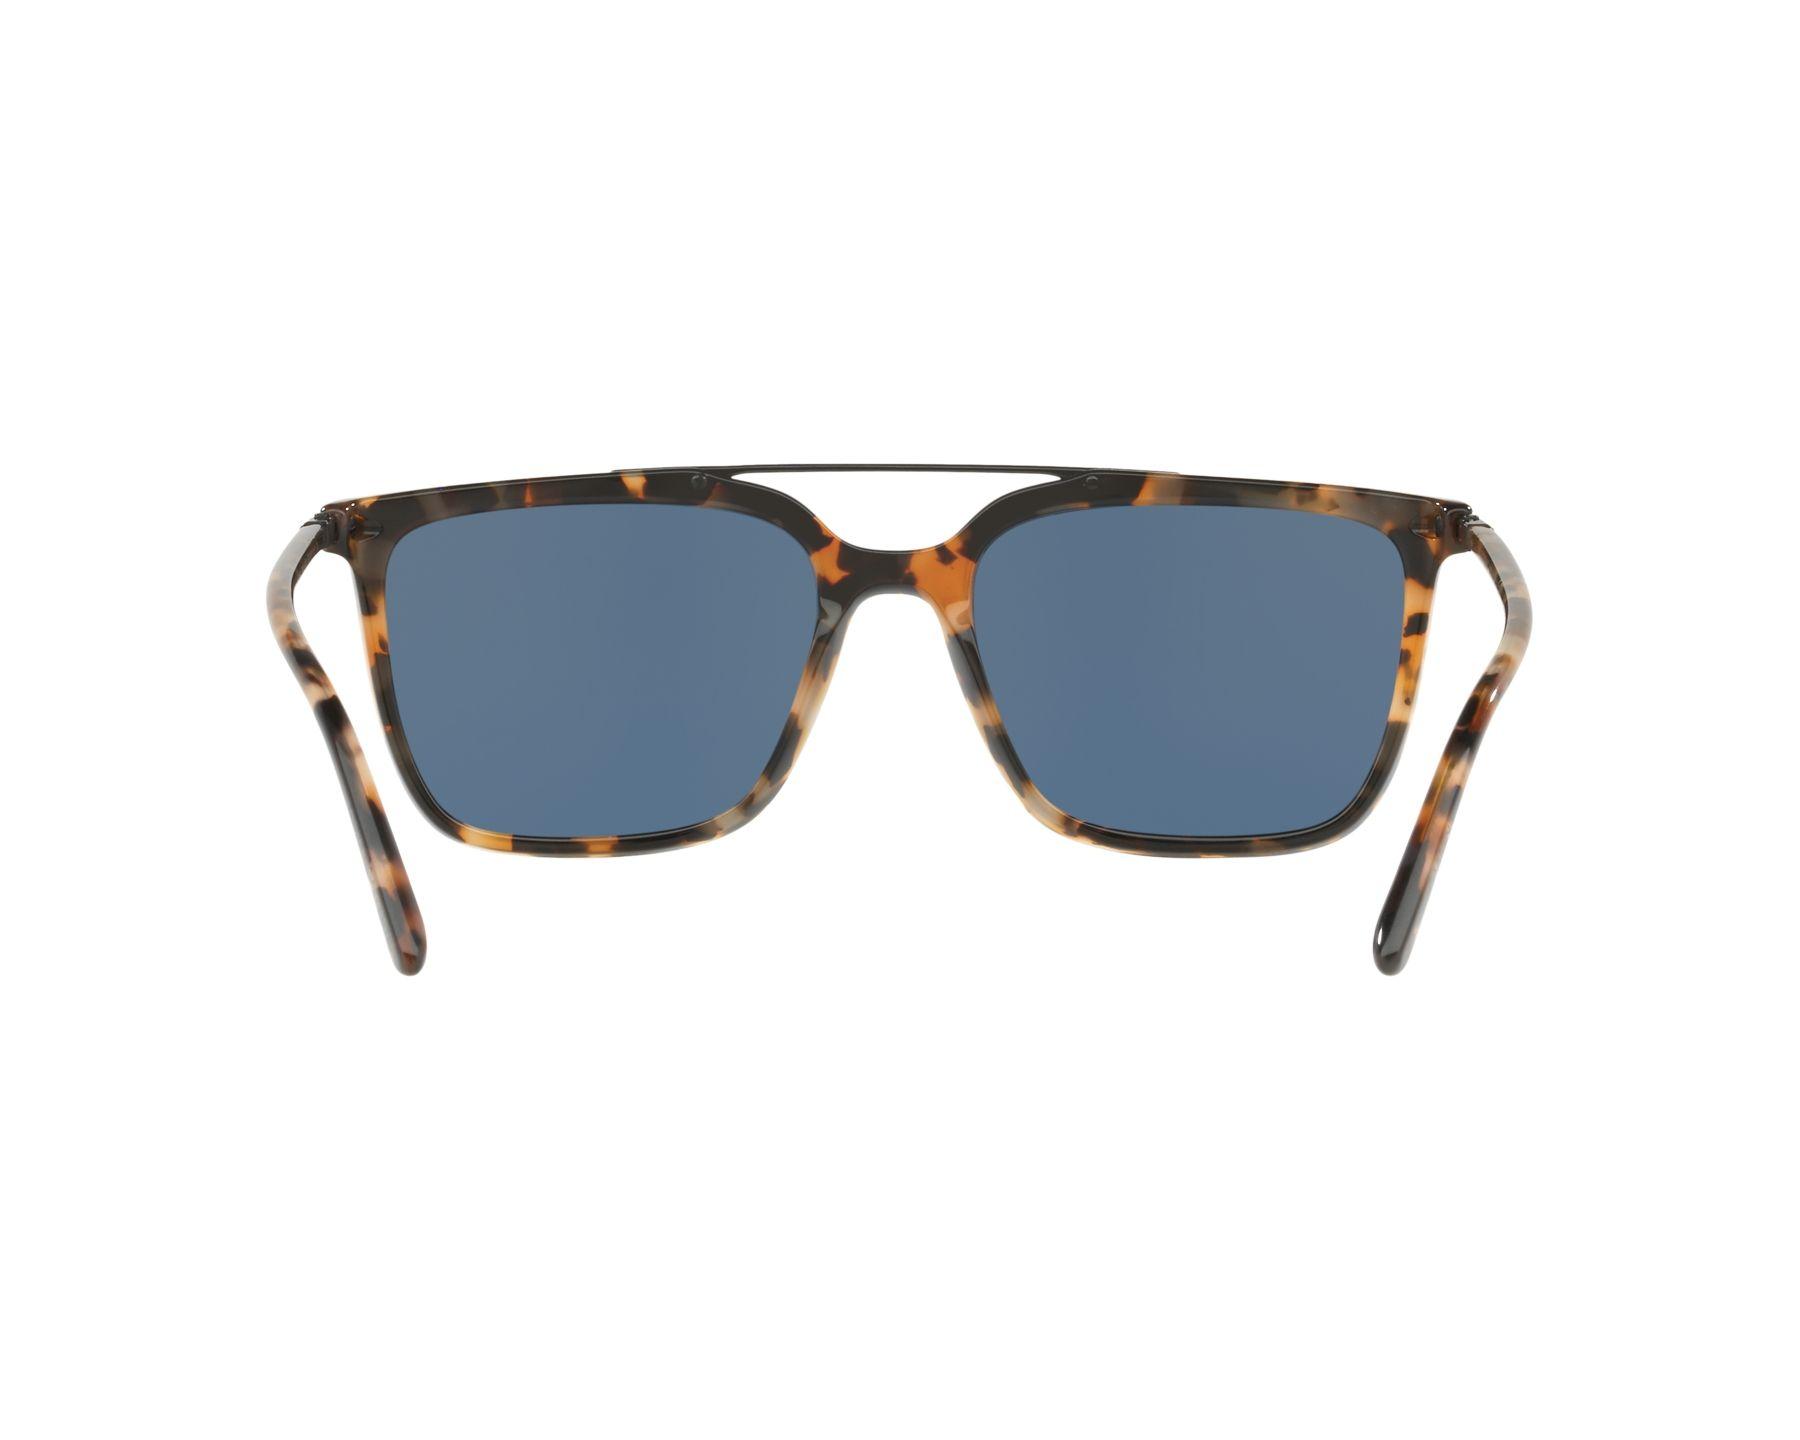 Dolce Gabbana 4318/314180 EnFLQ